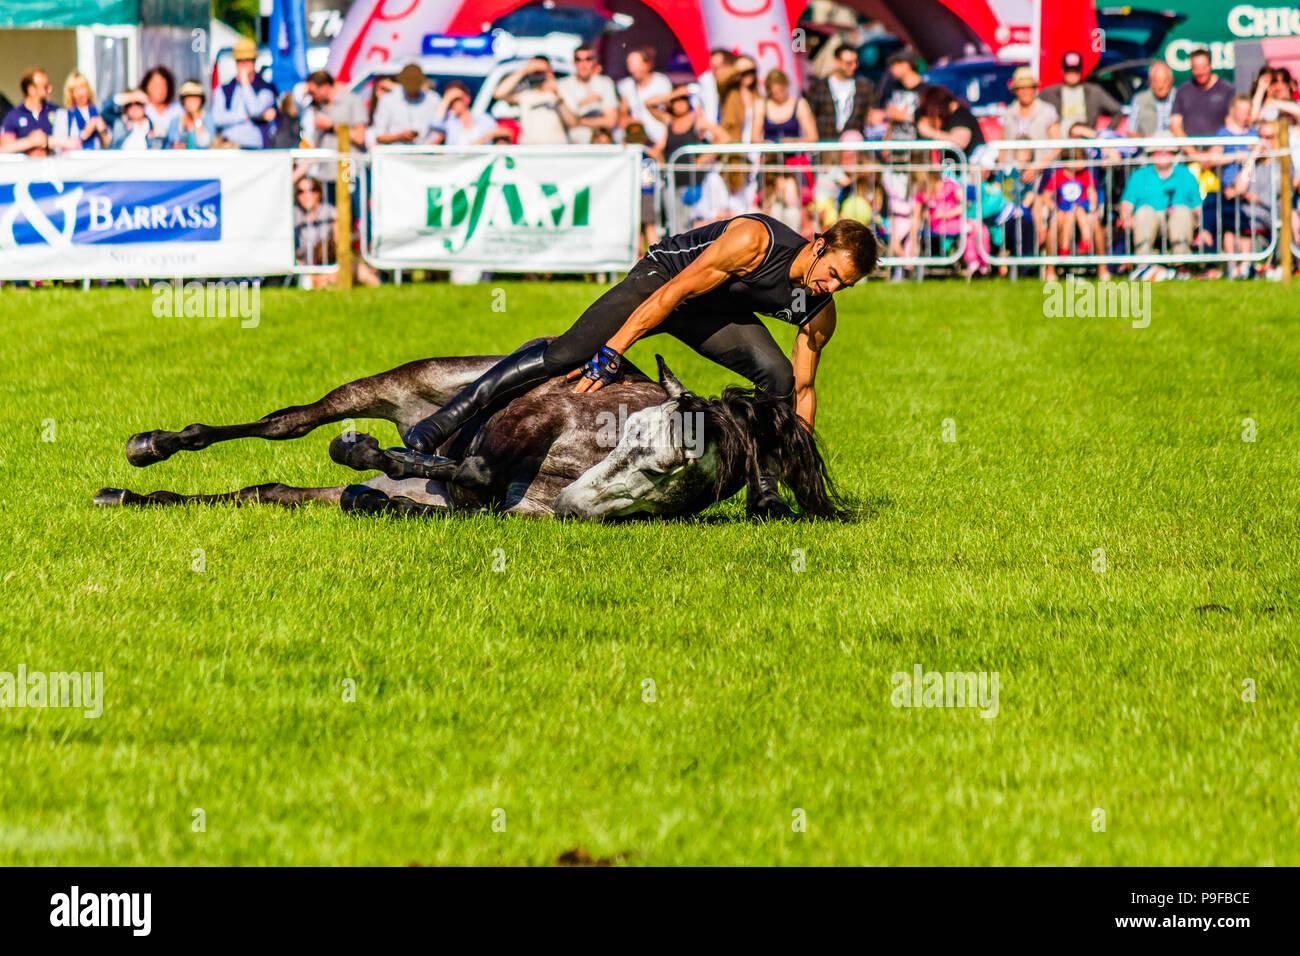 Stunt horseman from Atkinson Action Horses performing at Northumberland County Show 2018, UK. - Stock Image